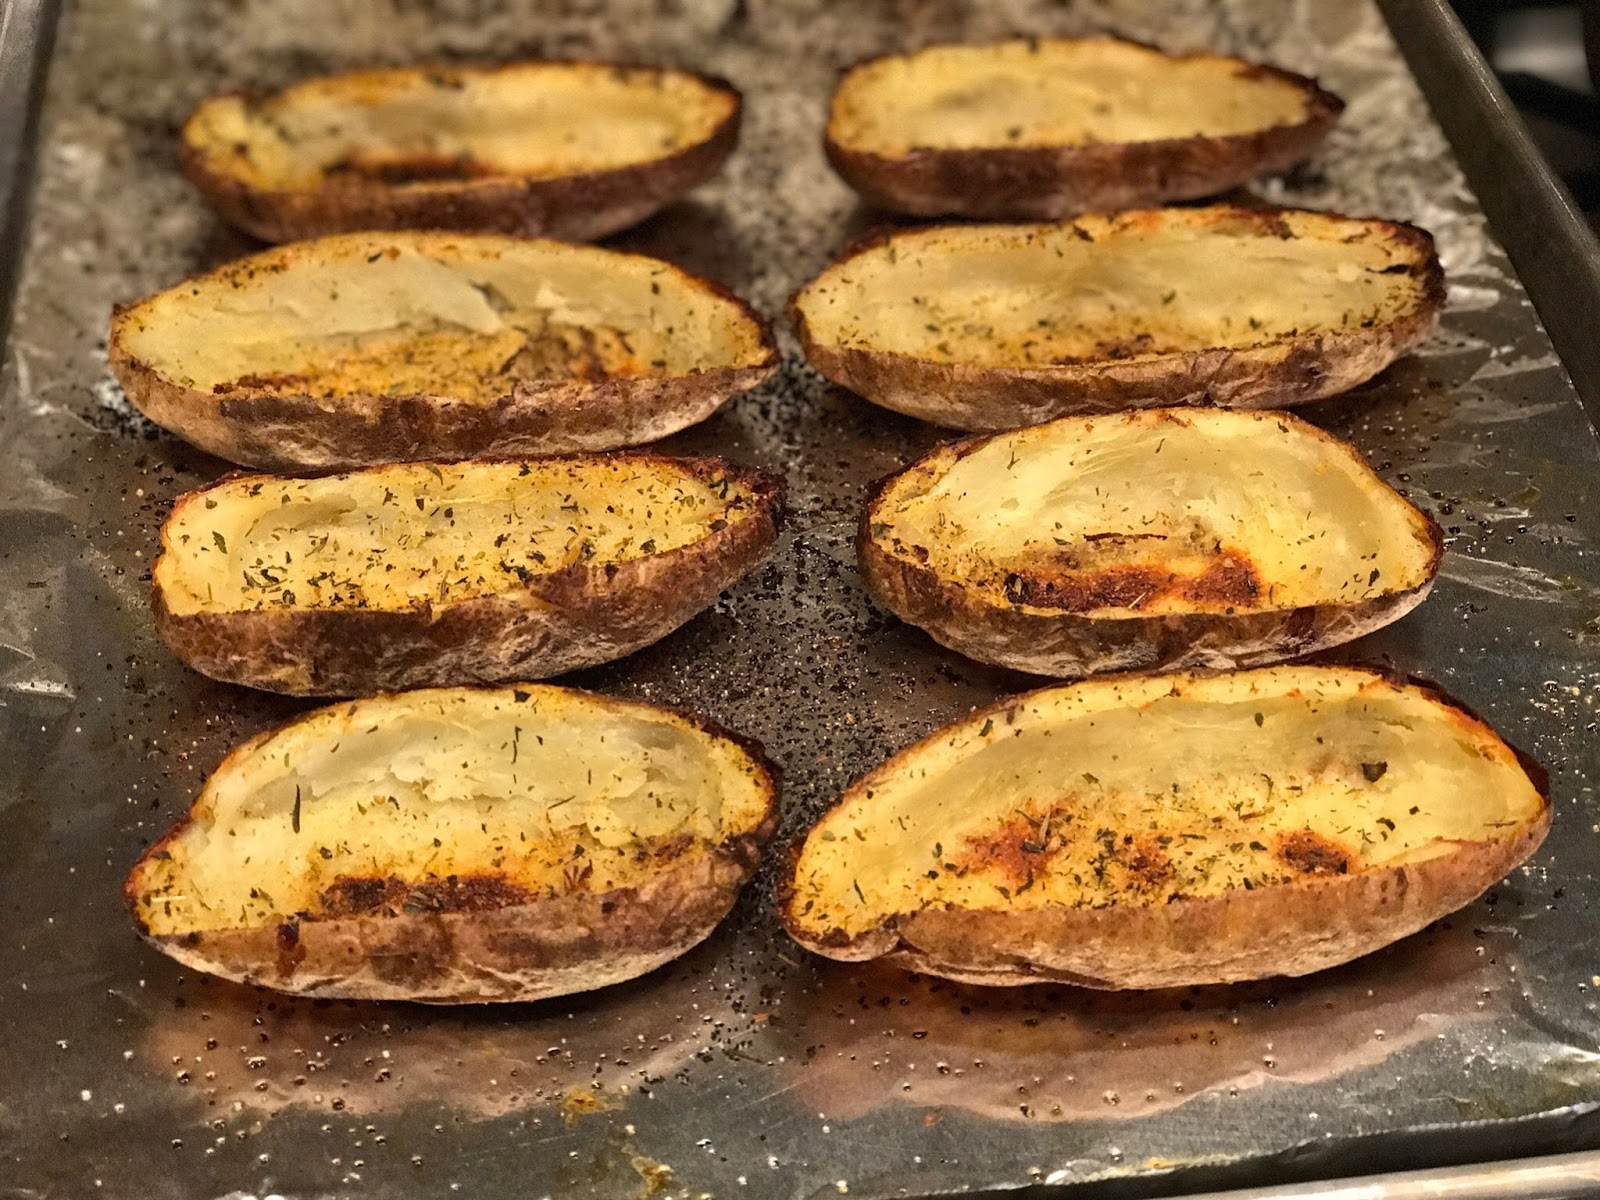 Greek Salad Style Potato Skins